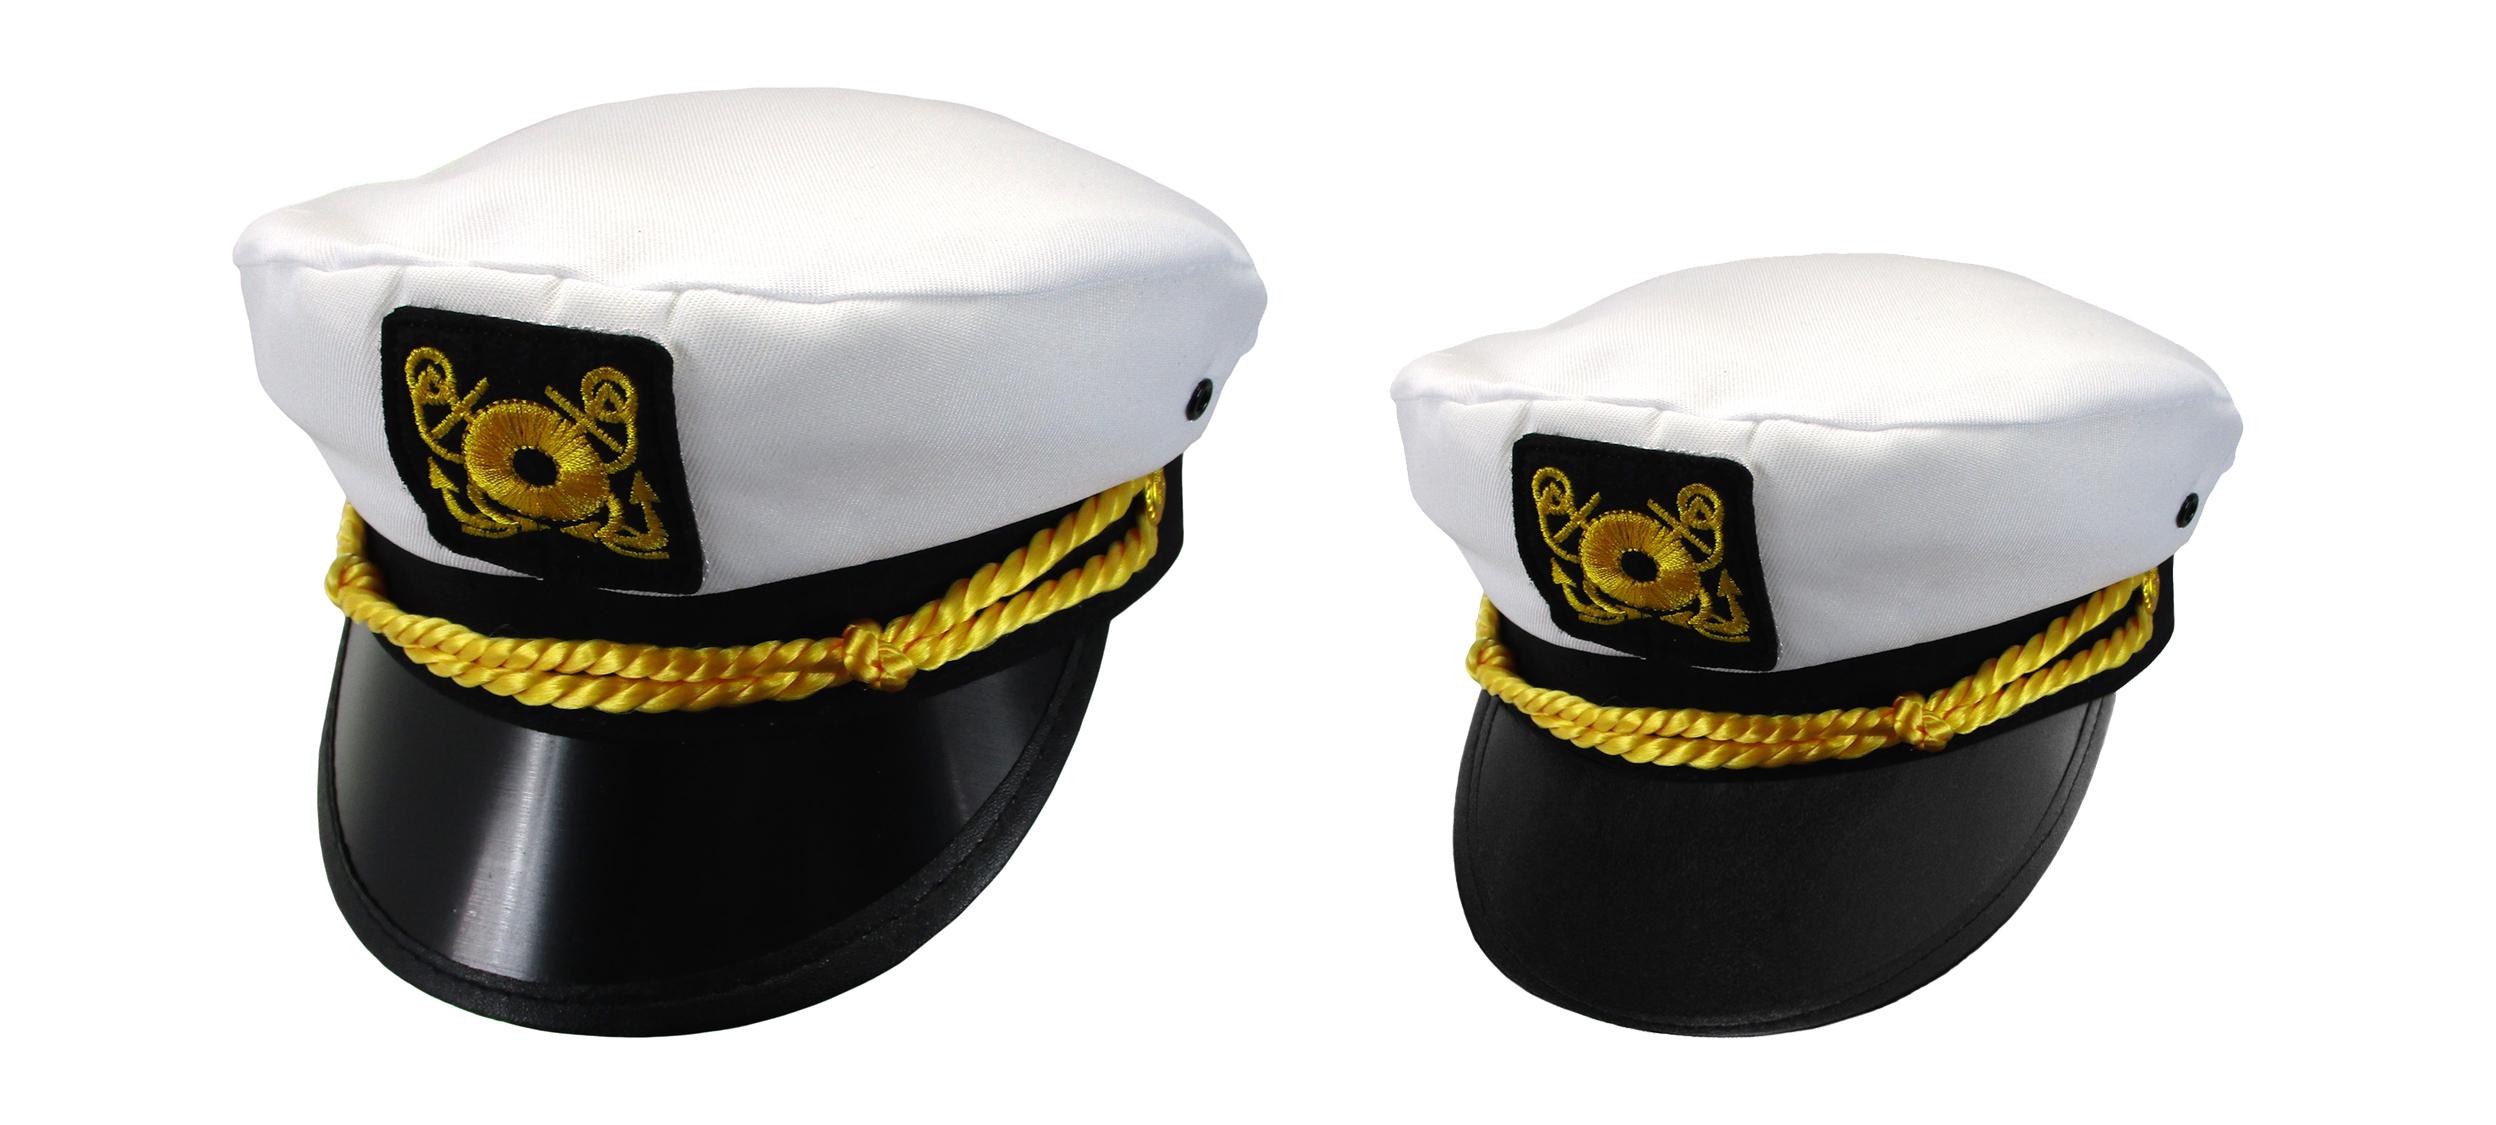 114c024edbd Adult Child Mens Womens Couples Ship Yacht Sea Skipper Boat Captain Hat Cap  Set